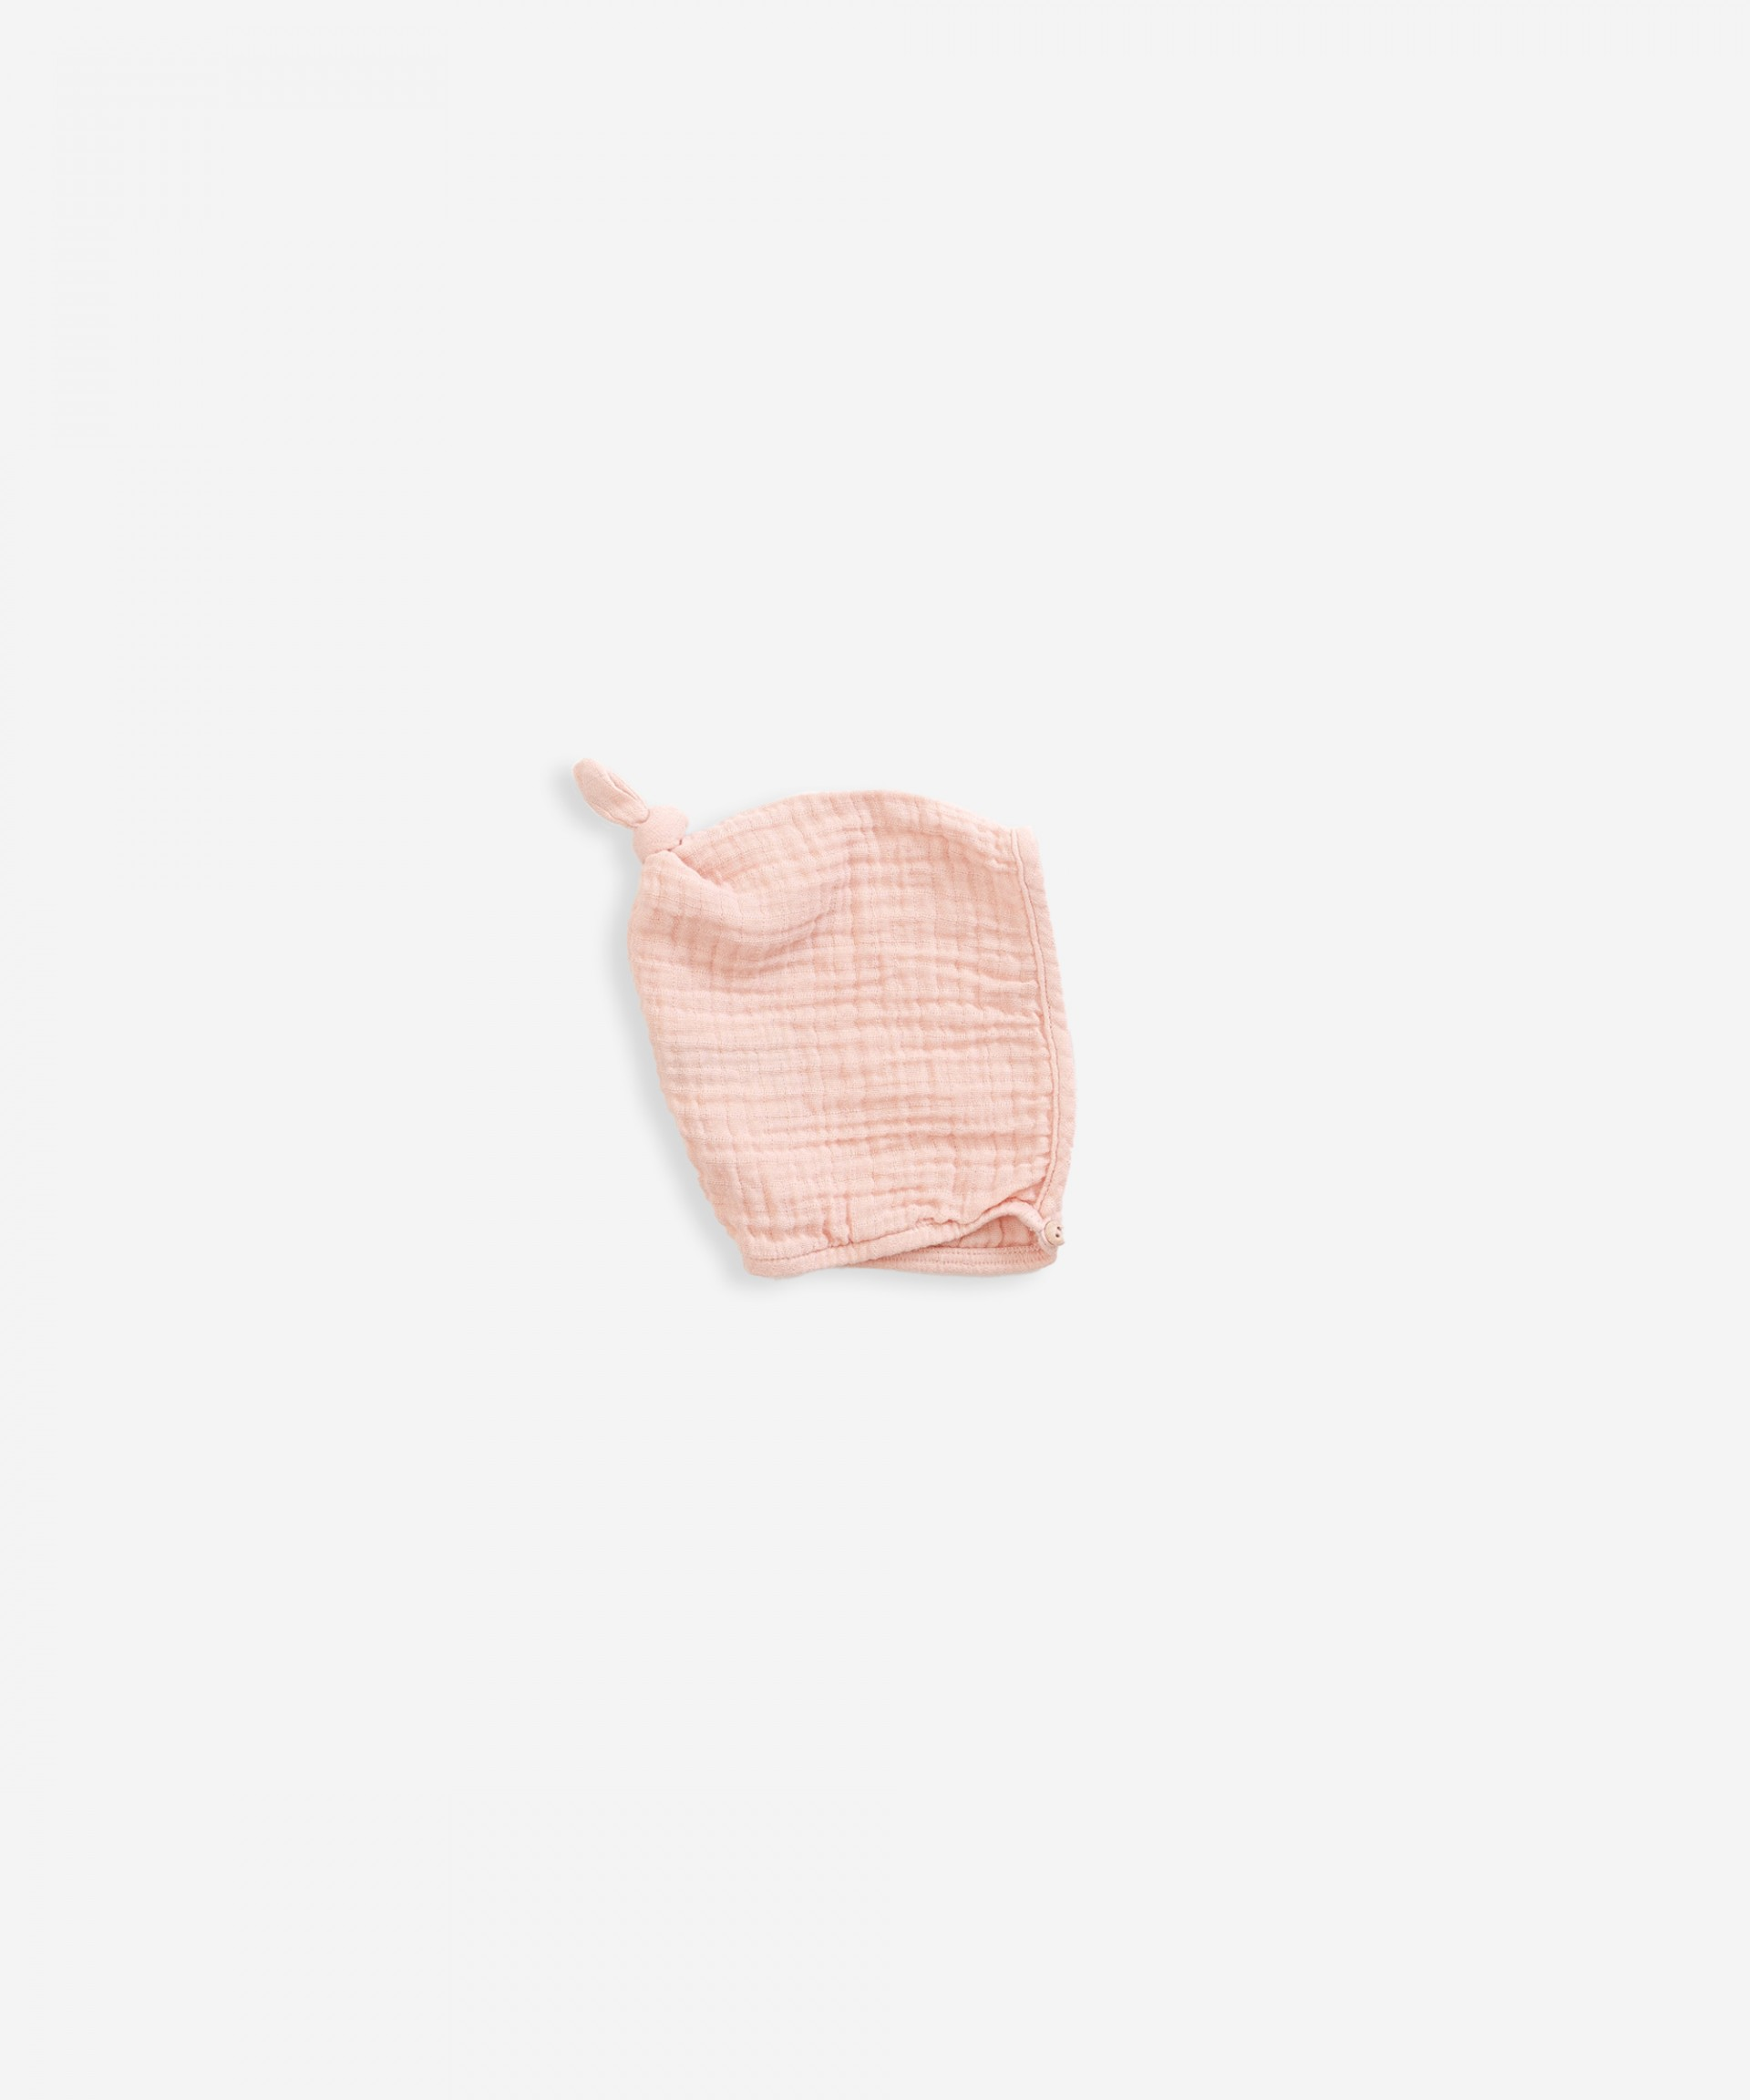 Gorro tricotado de algodón orgánico |Weaving